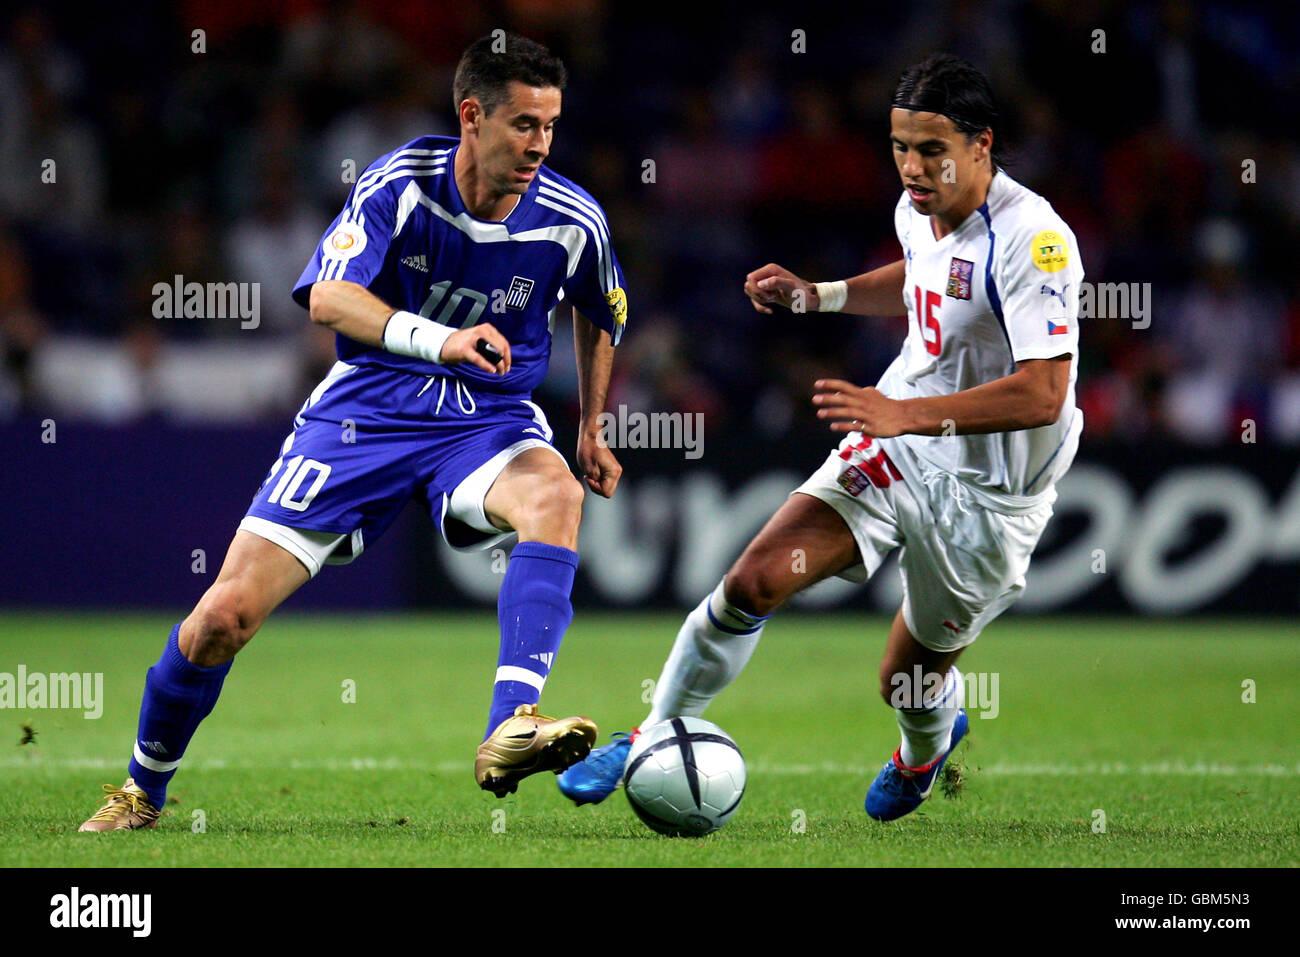 Soccer - UEFA European Championship 2004 - Semi Final - Greece v Czech Republic Stock Photo